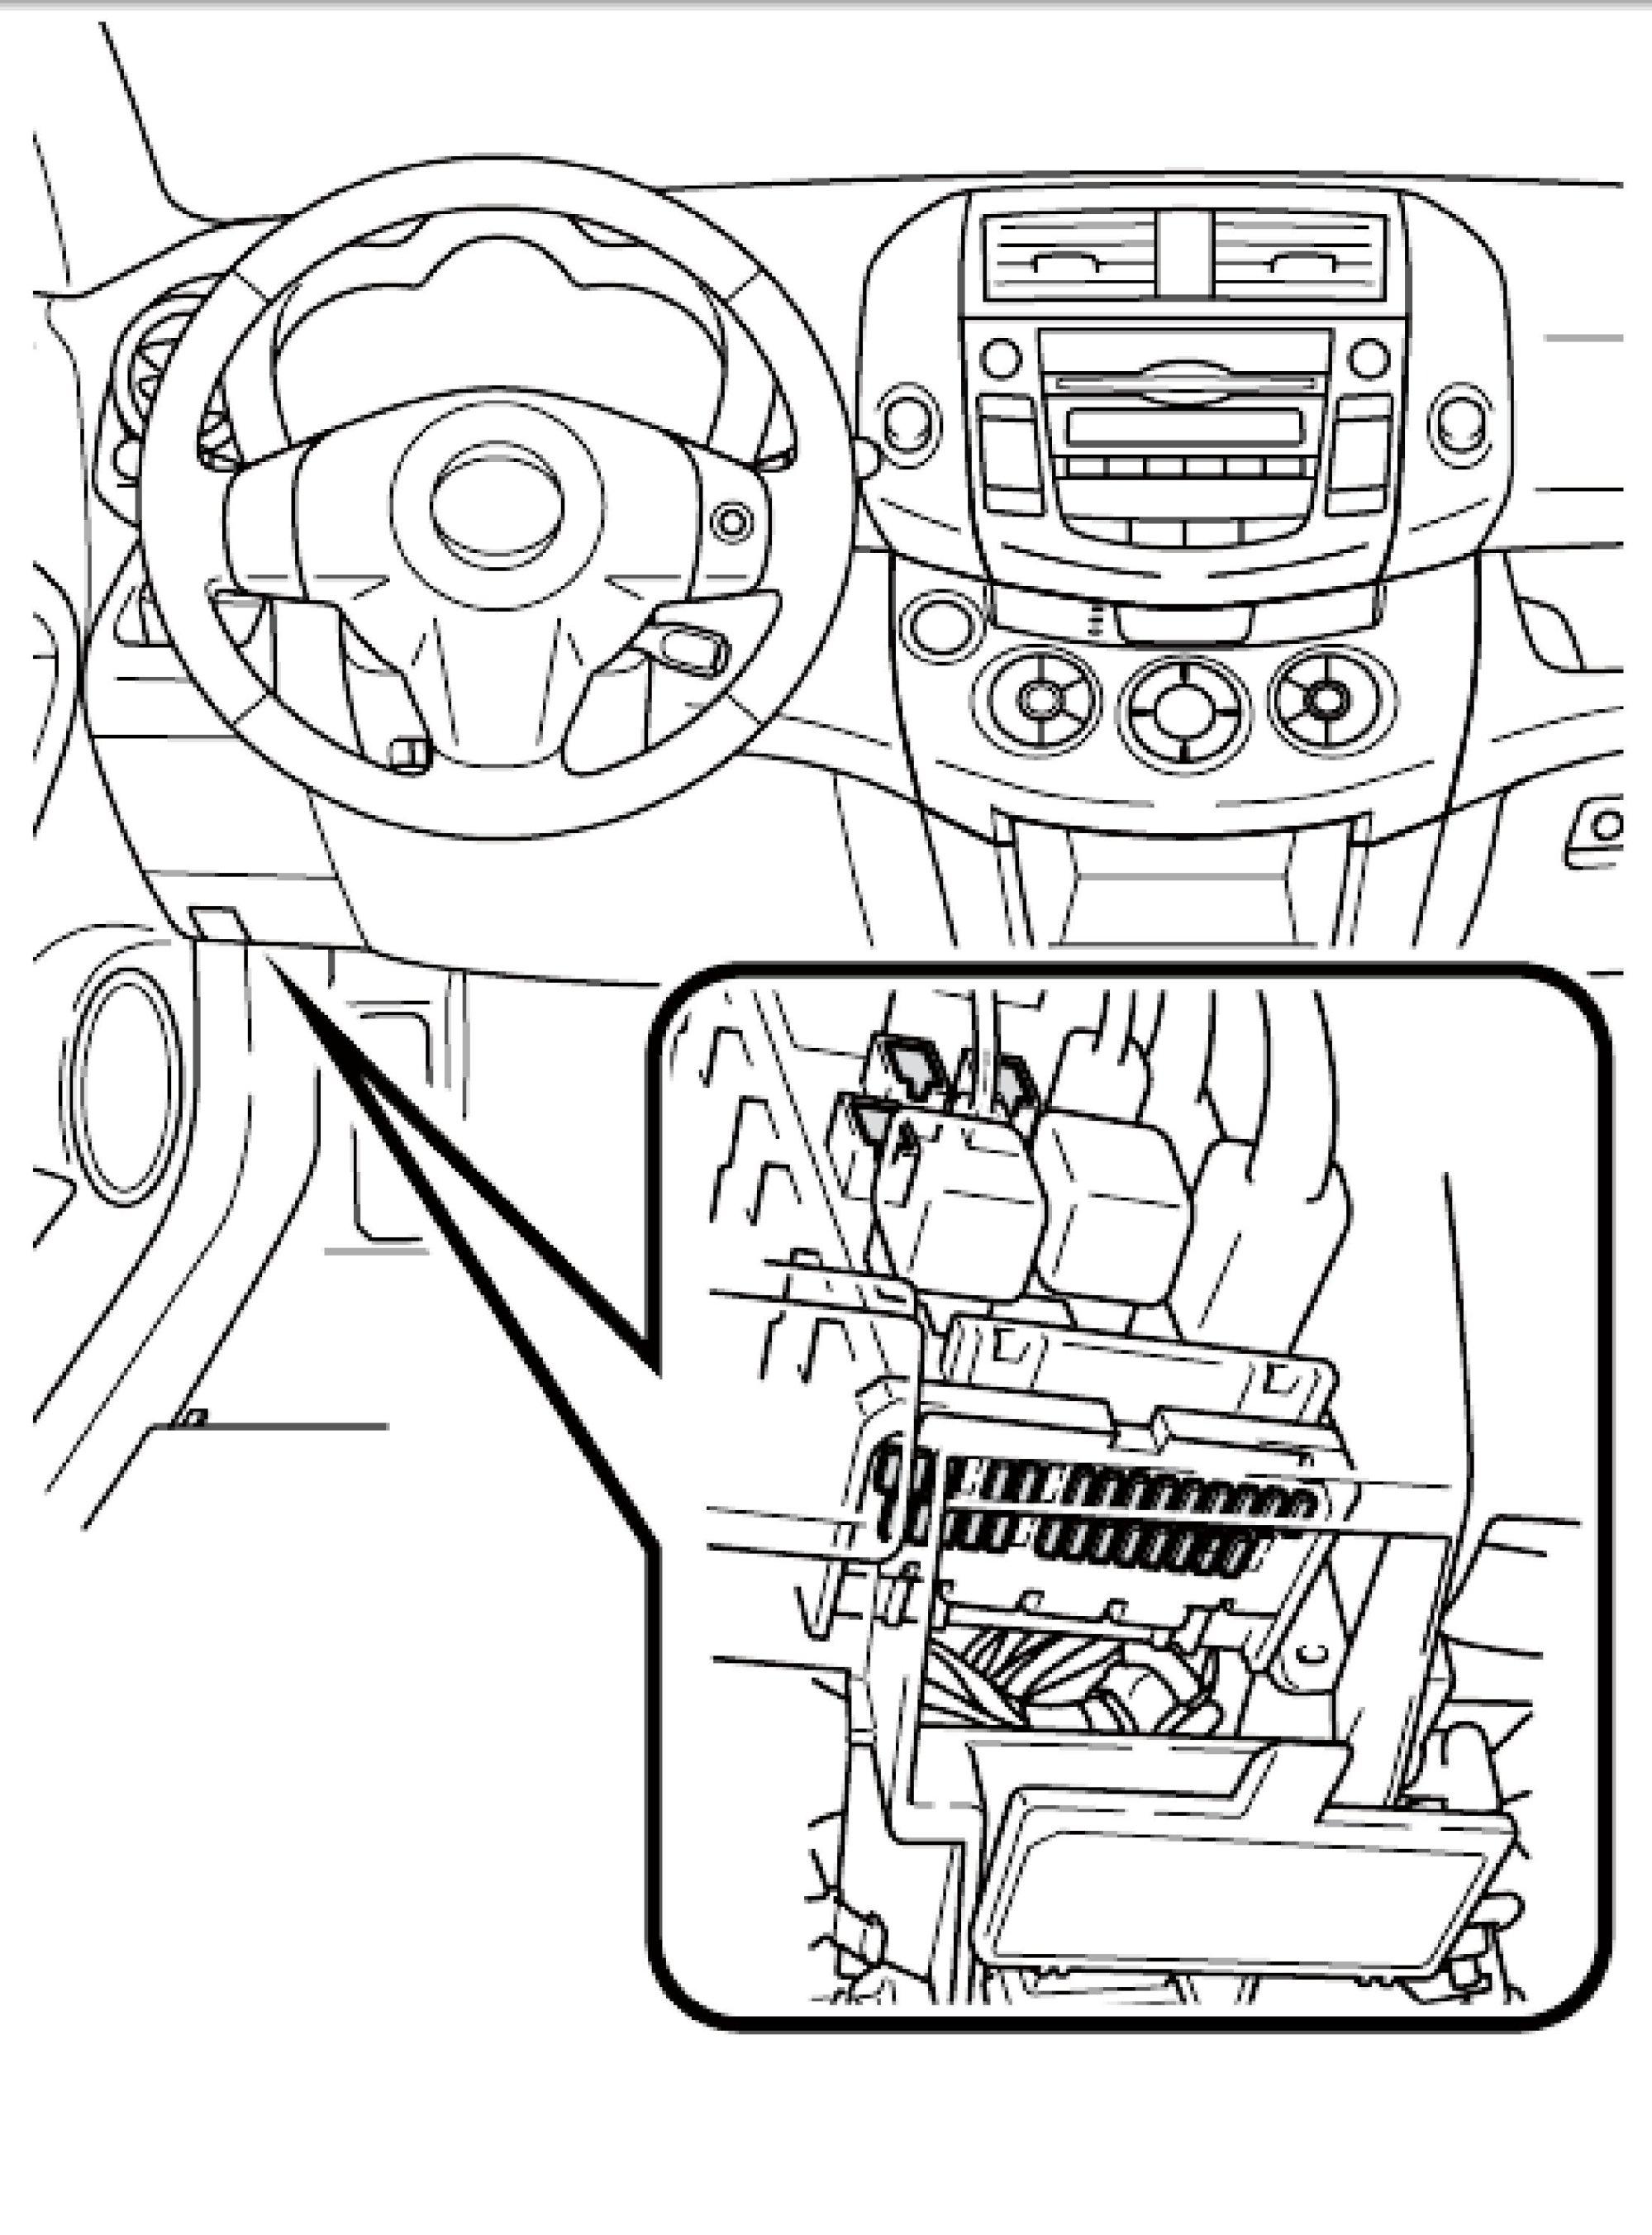 hight resolution of 2002 toyota corolla fuse box diagram